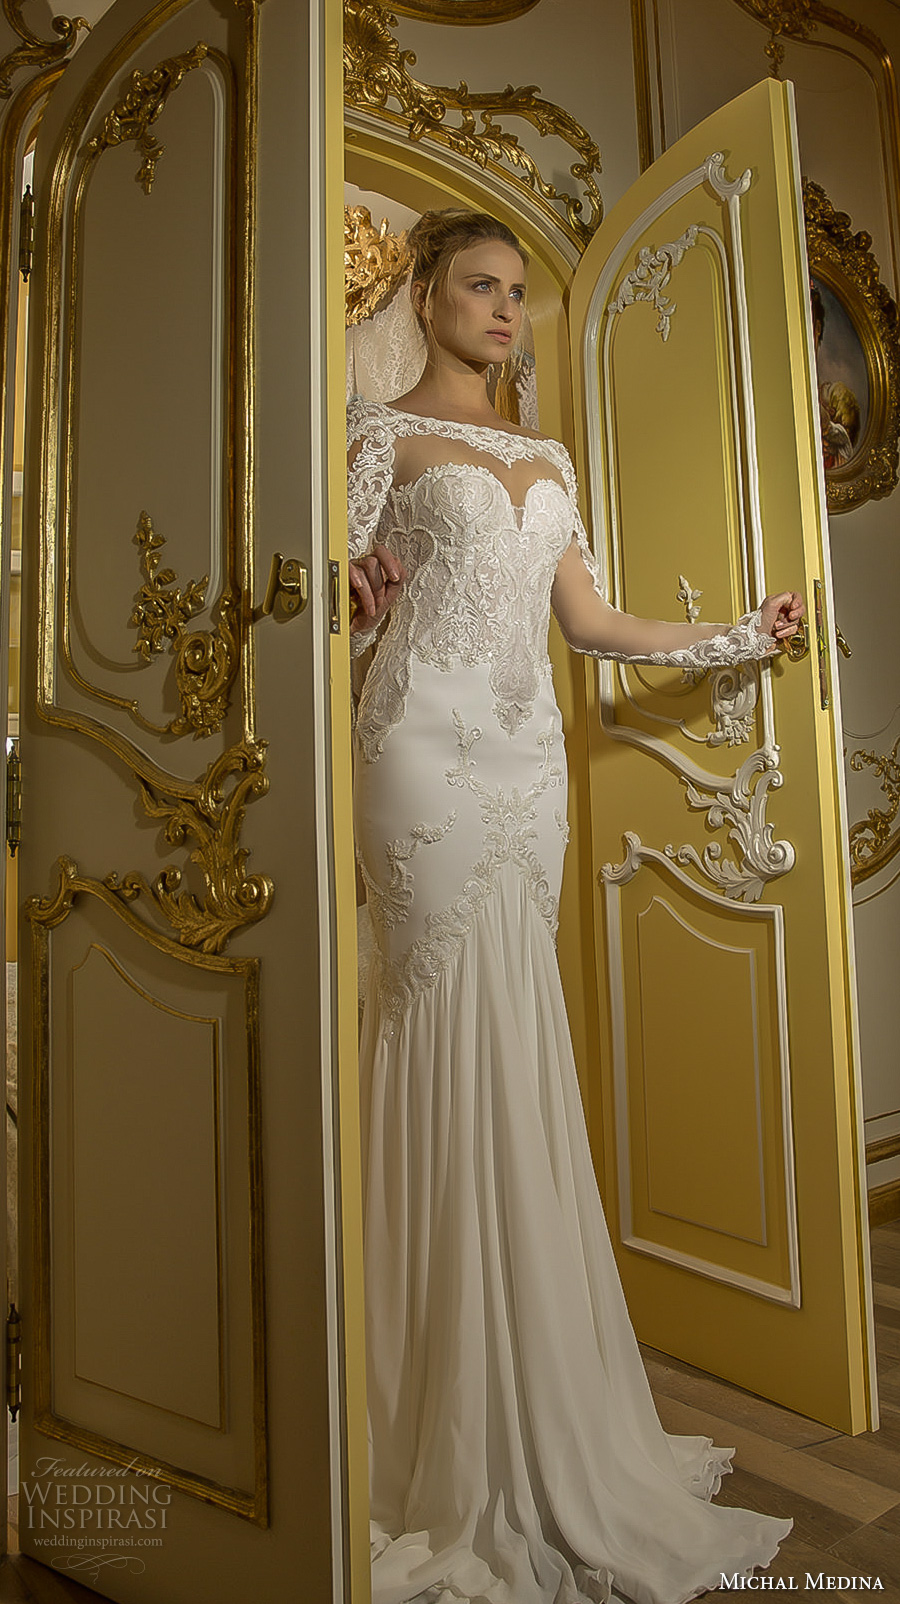 michal medina 2017 bridal long sleeves illusion beateau sweetheart neckline heavily embellished bodice elegant sheath fit flare wedding dress open low back chapel train (emma) mv